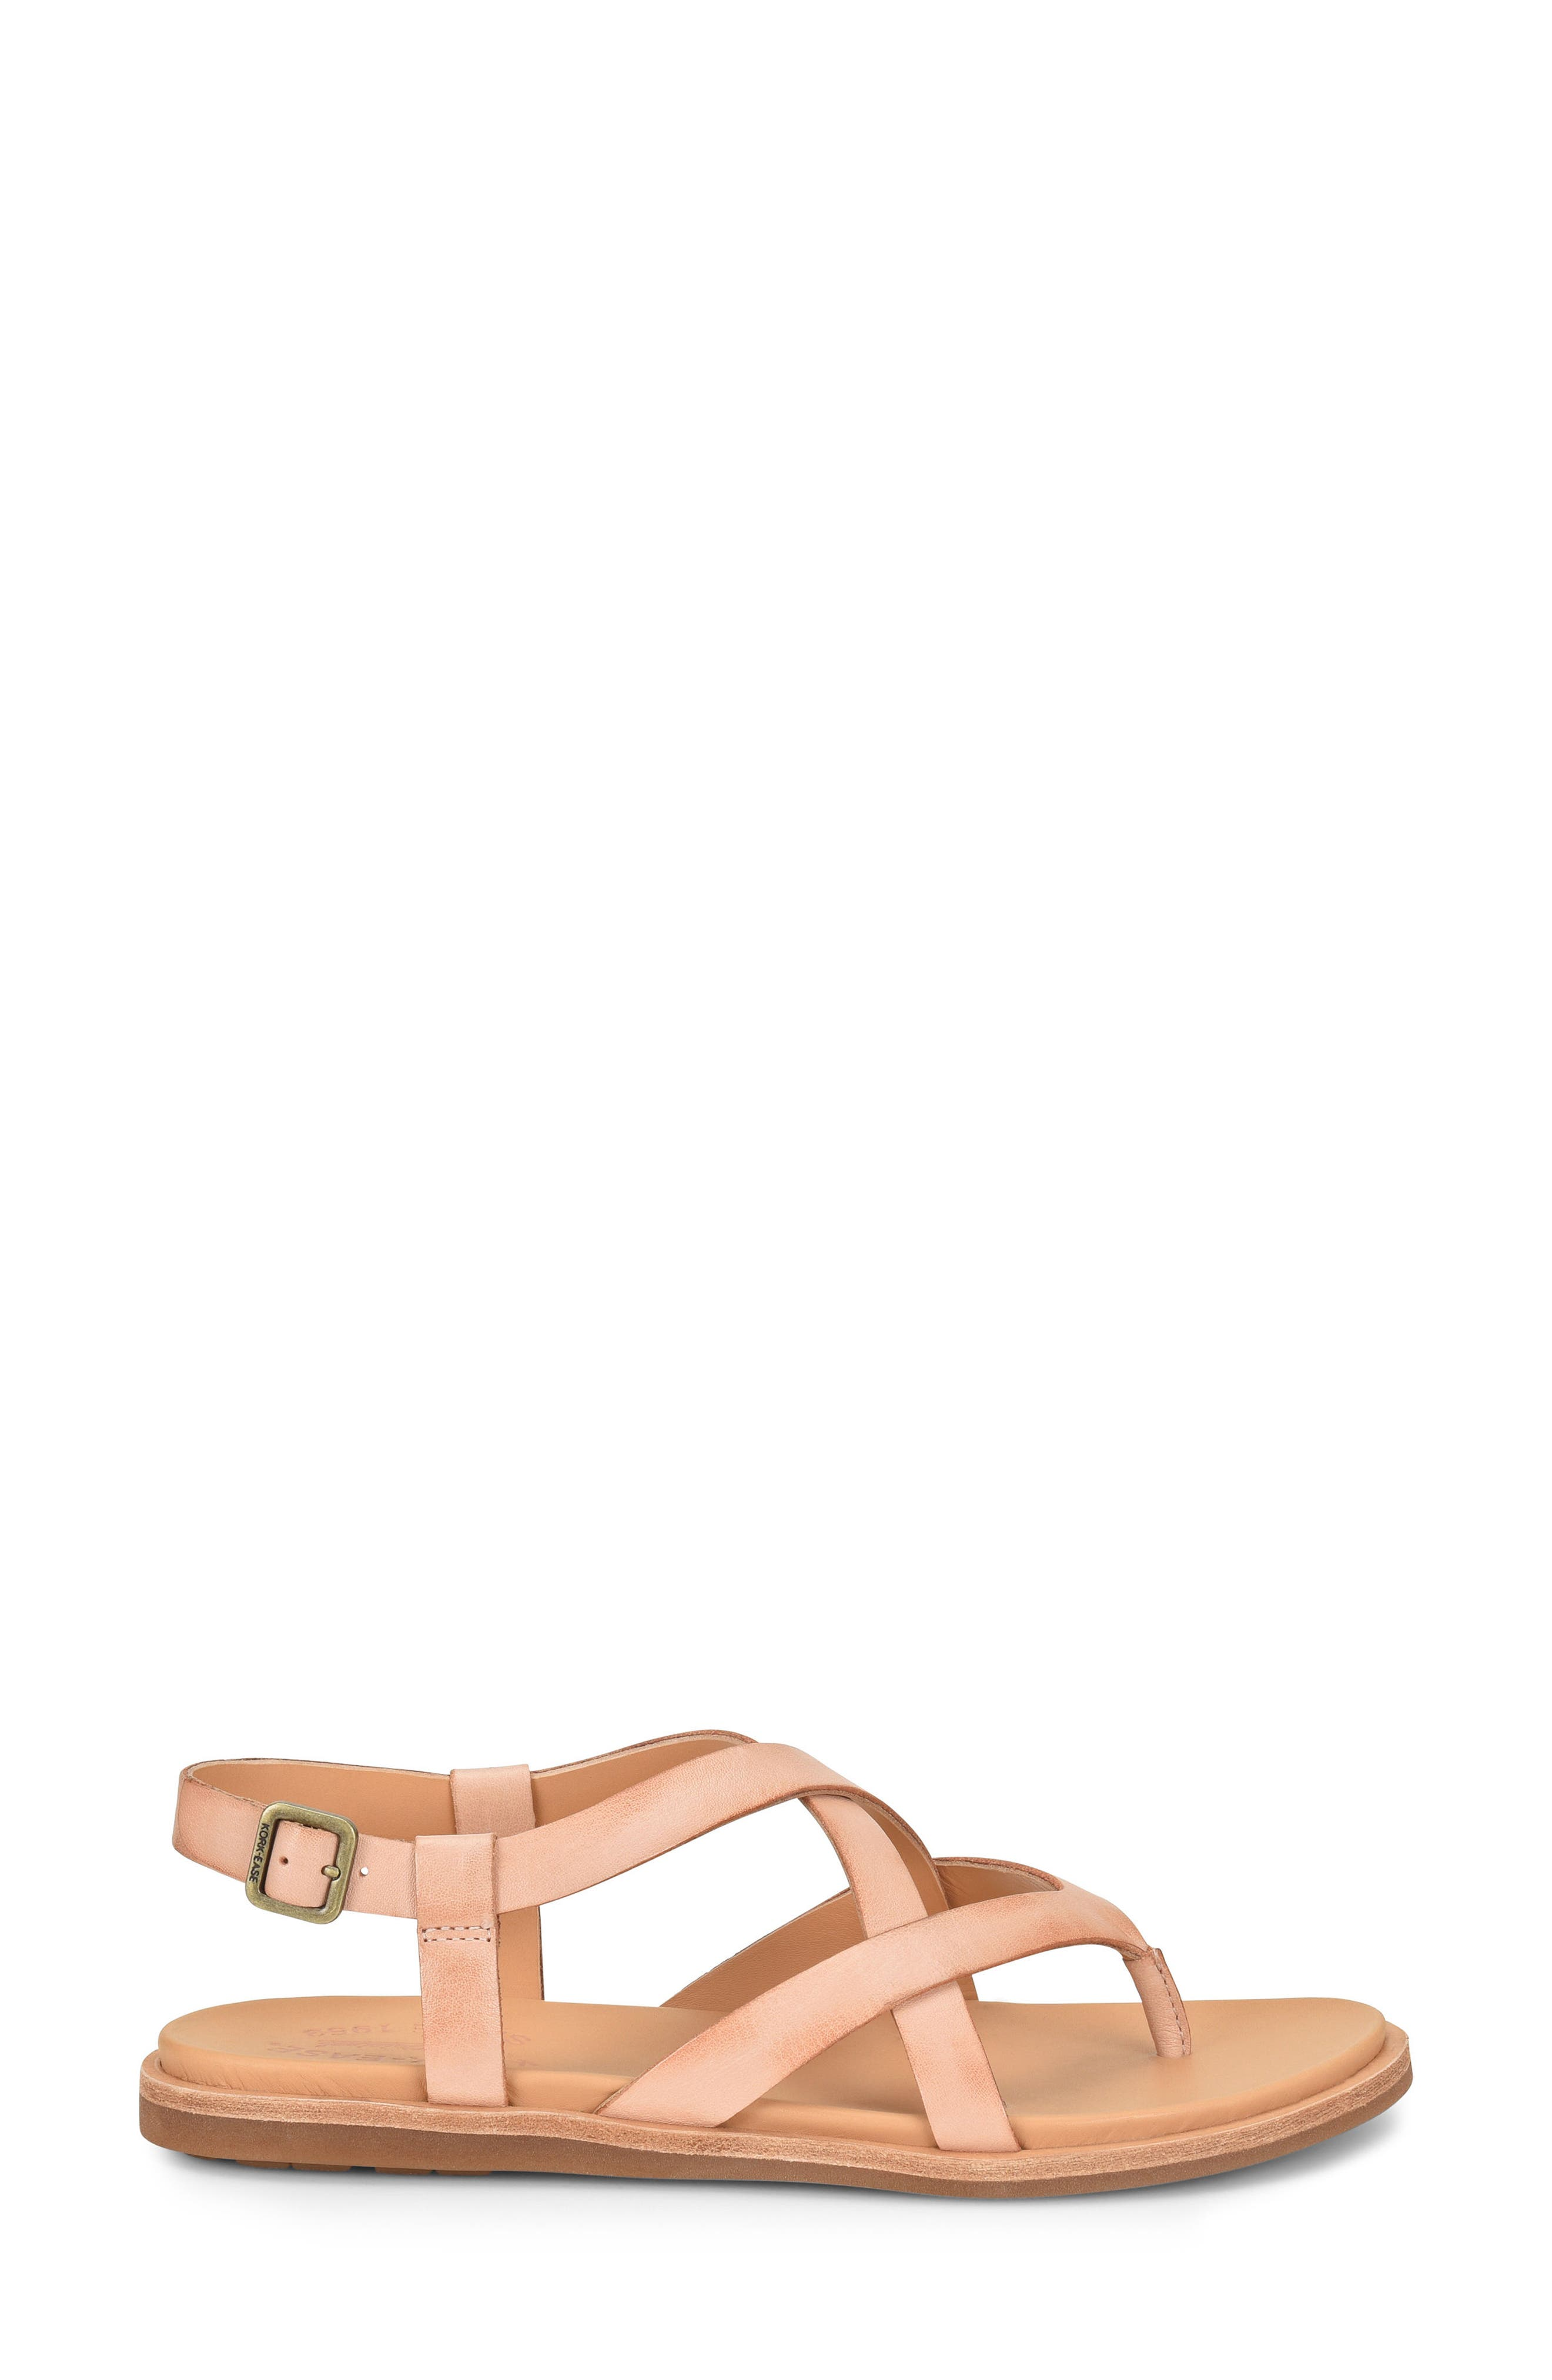 Yarbrough Sandal,                             Alternate thumbnail 3, color,                             Blush Leather